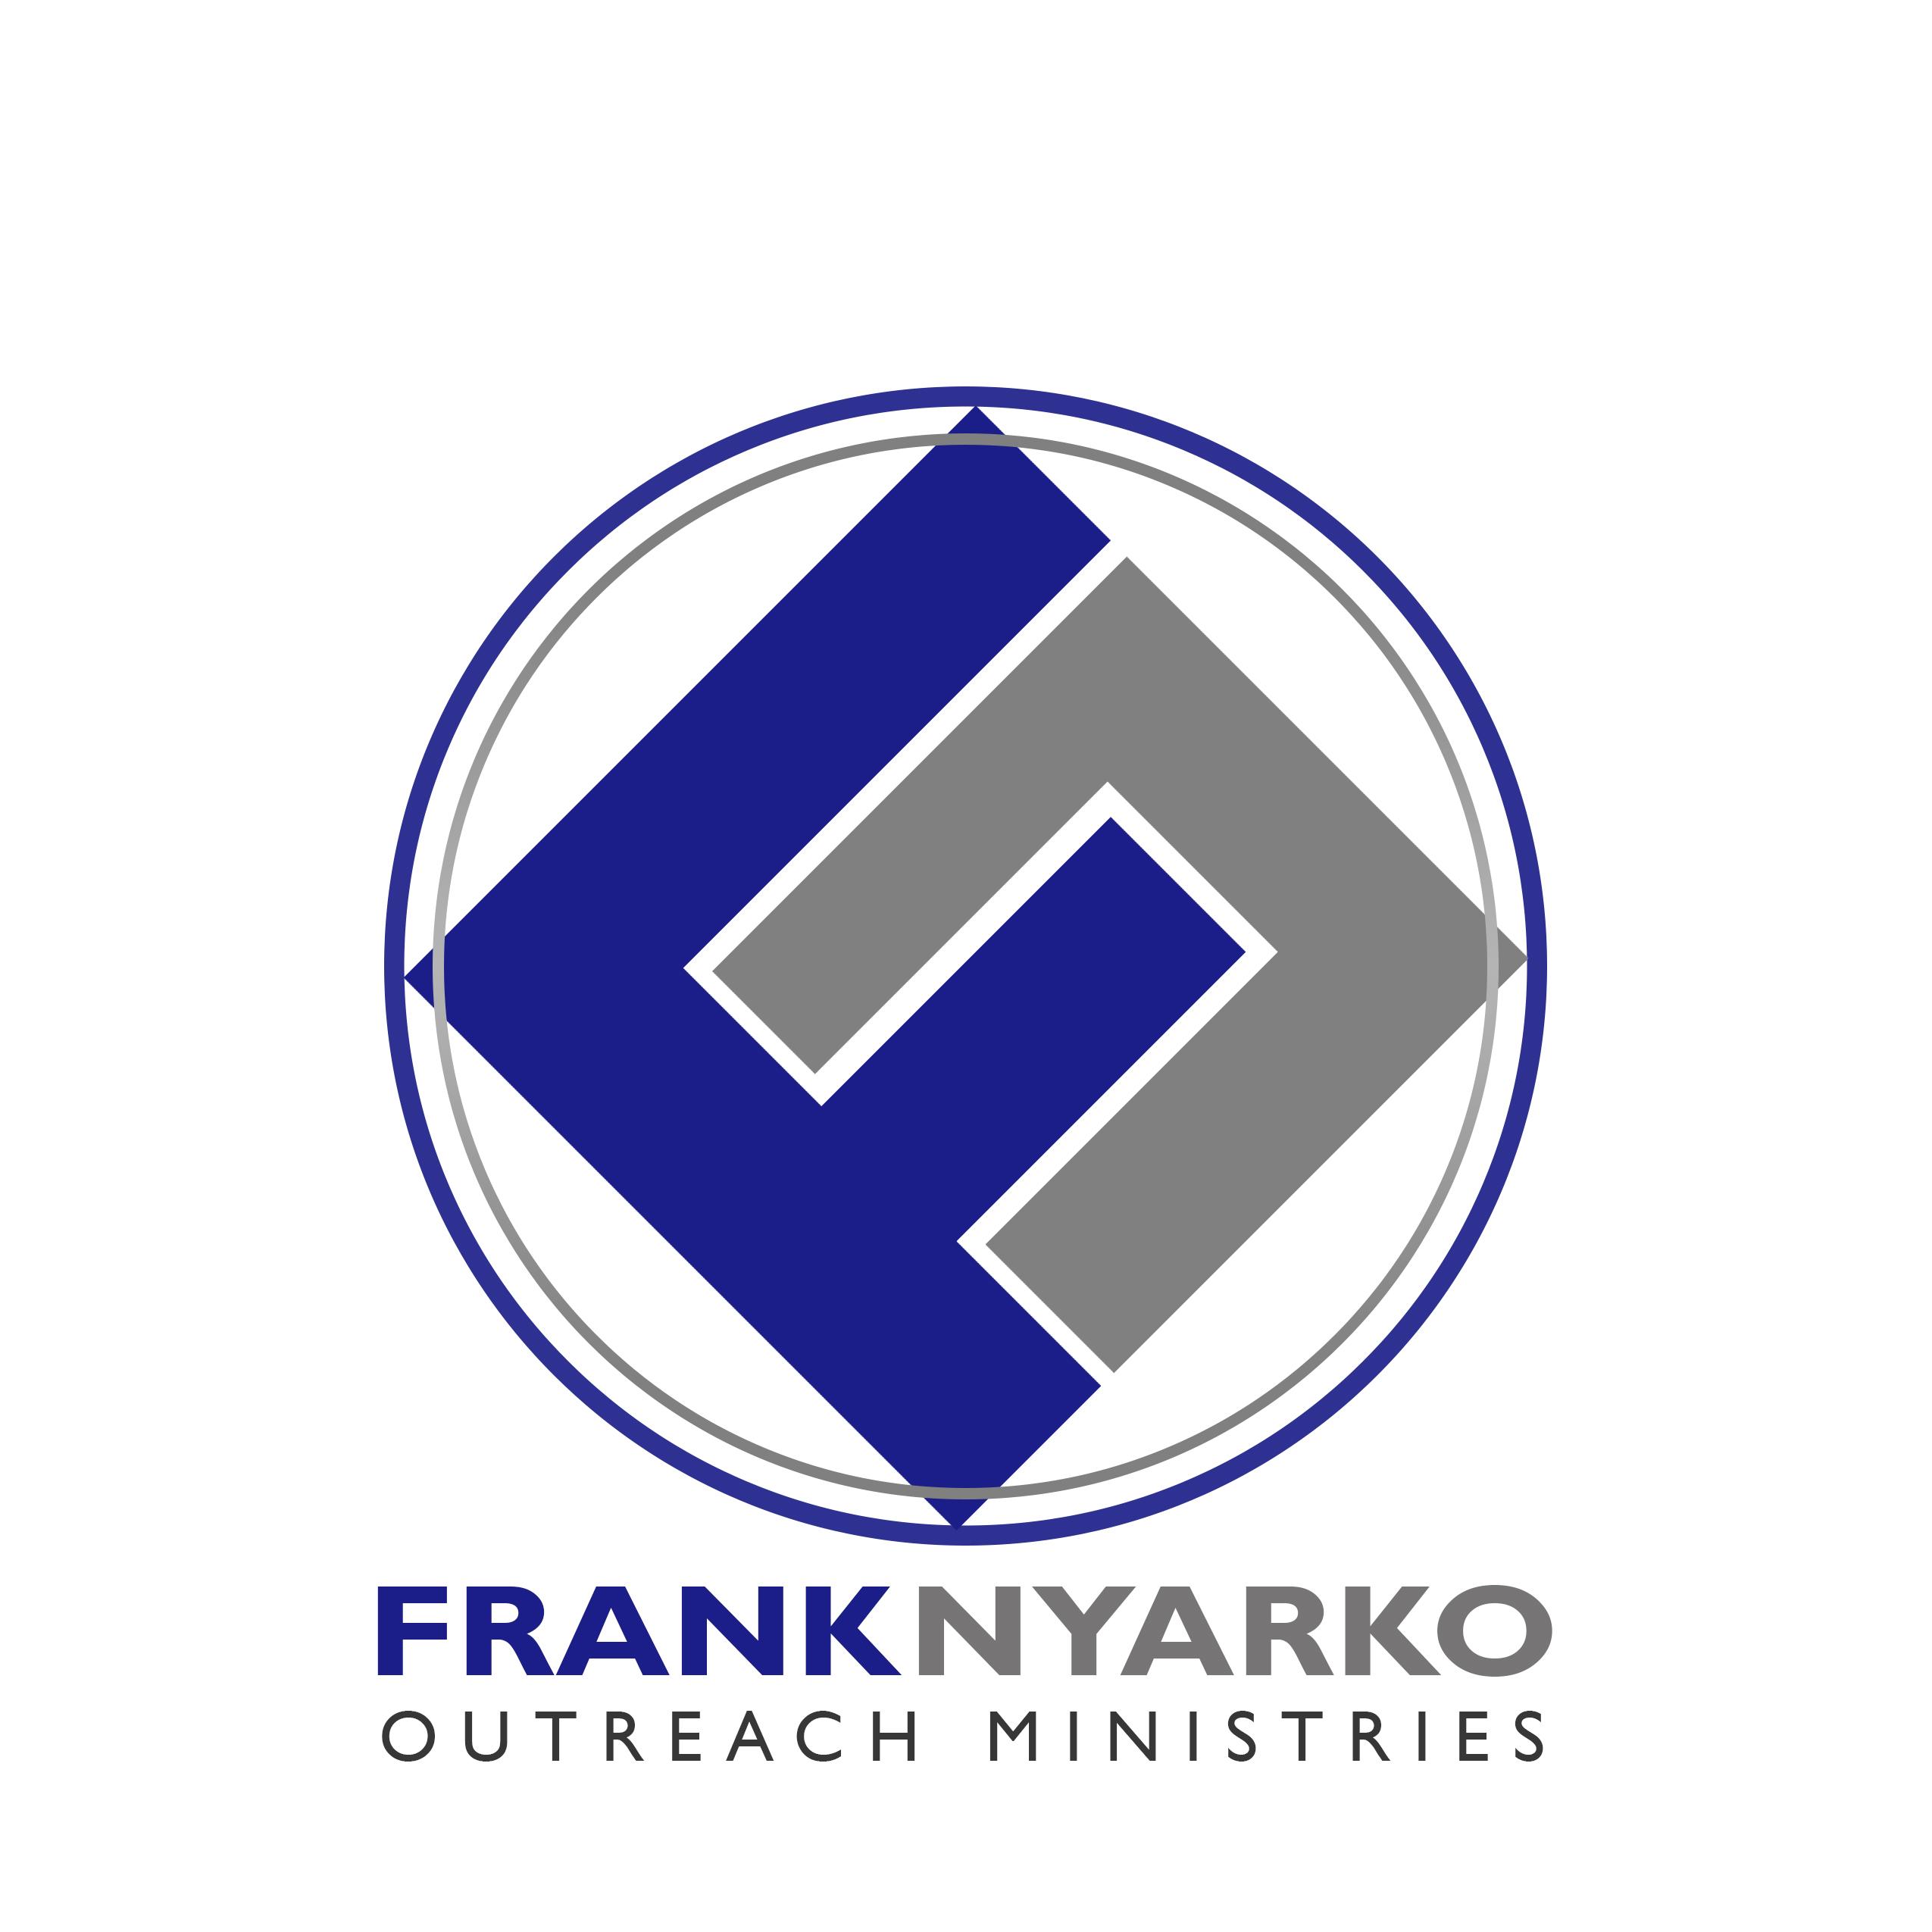 Frank Nyarko Outreach Ministries